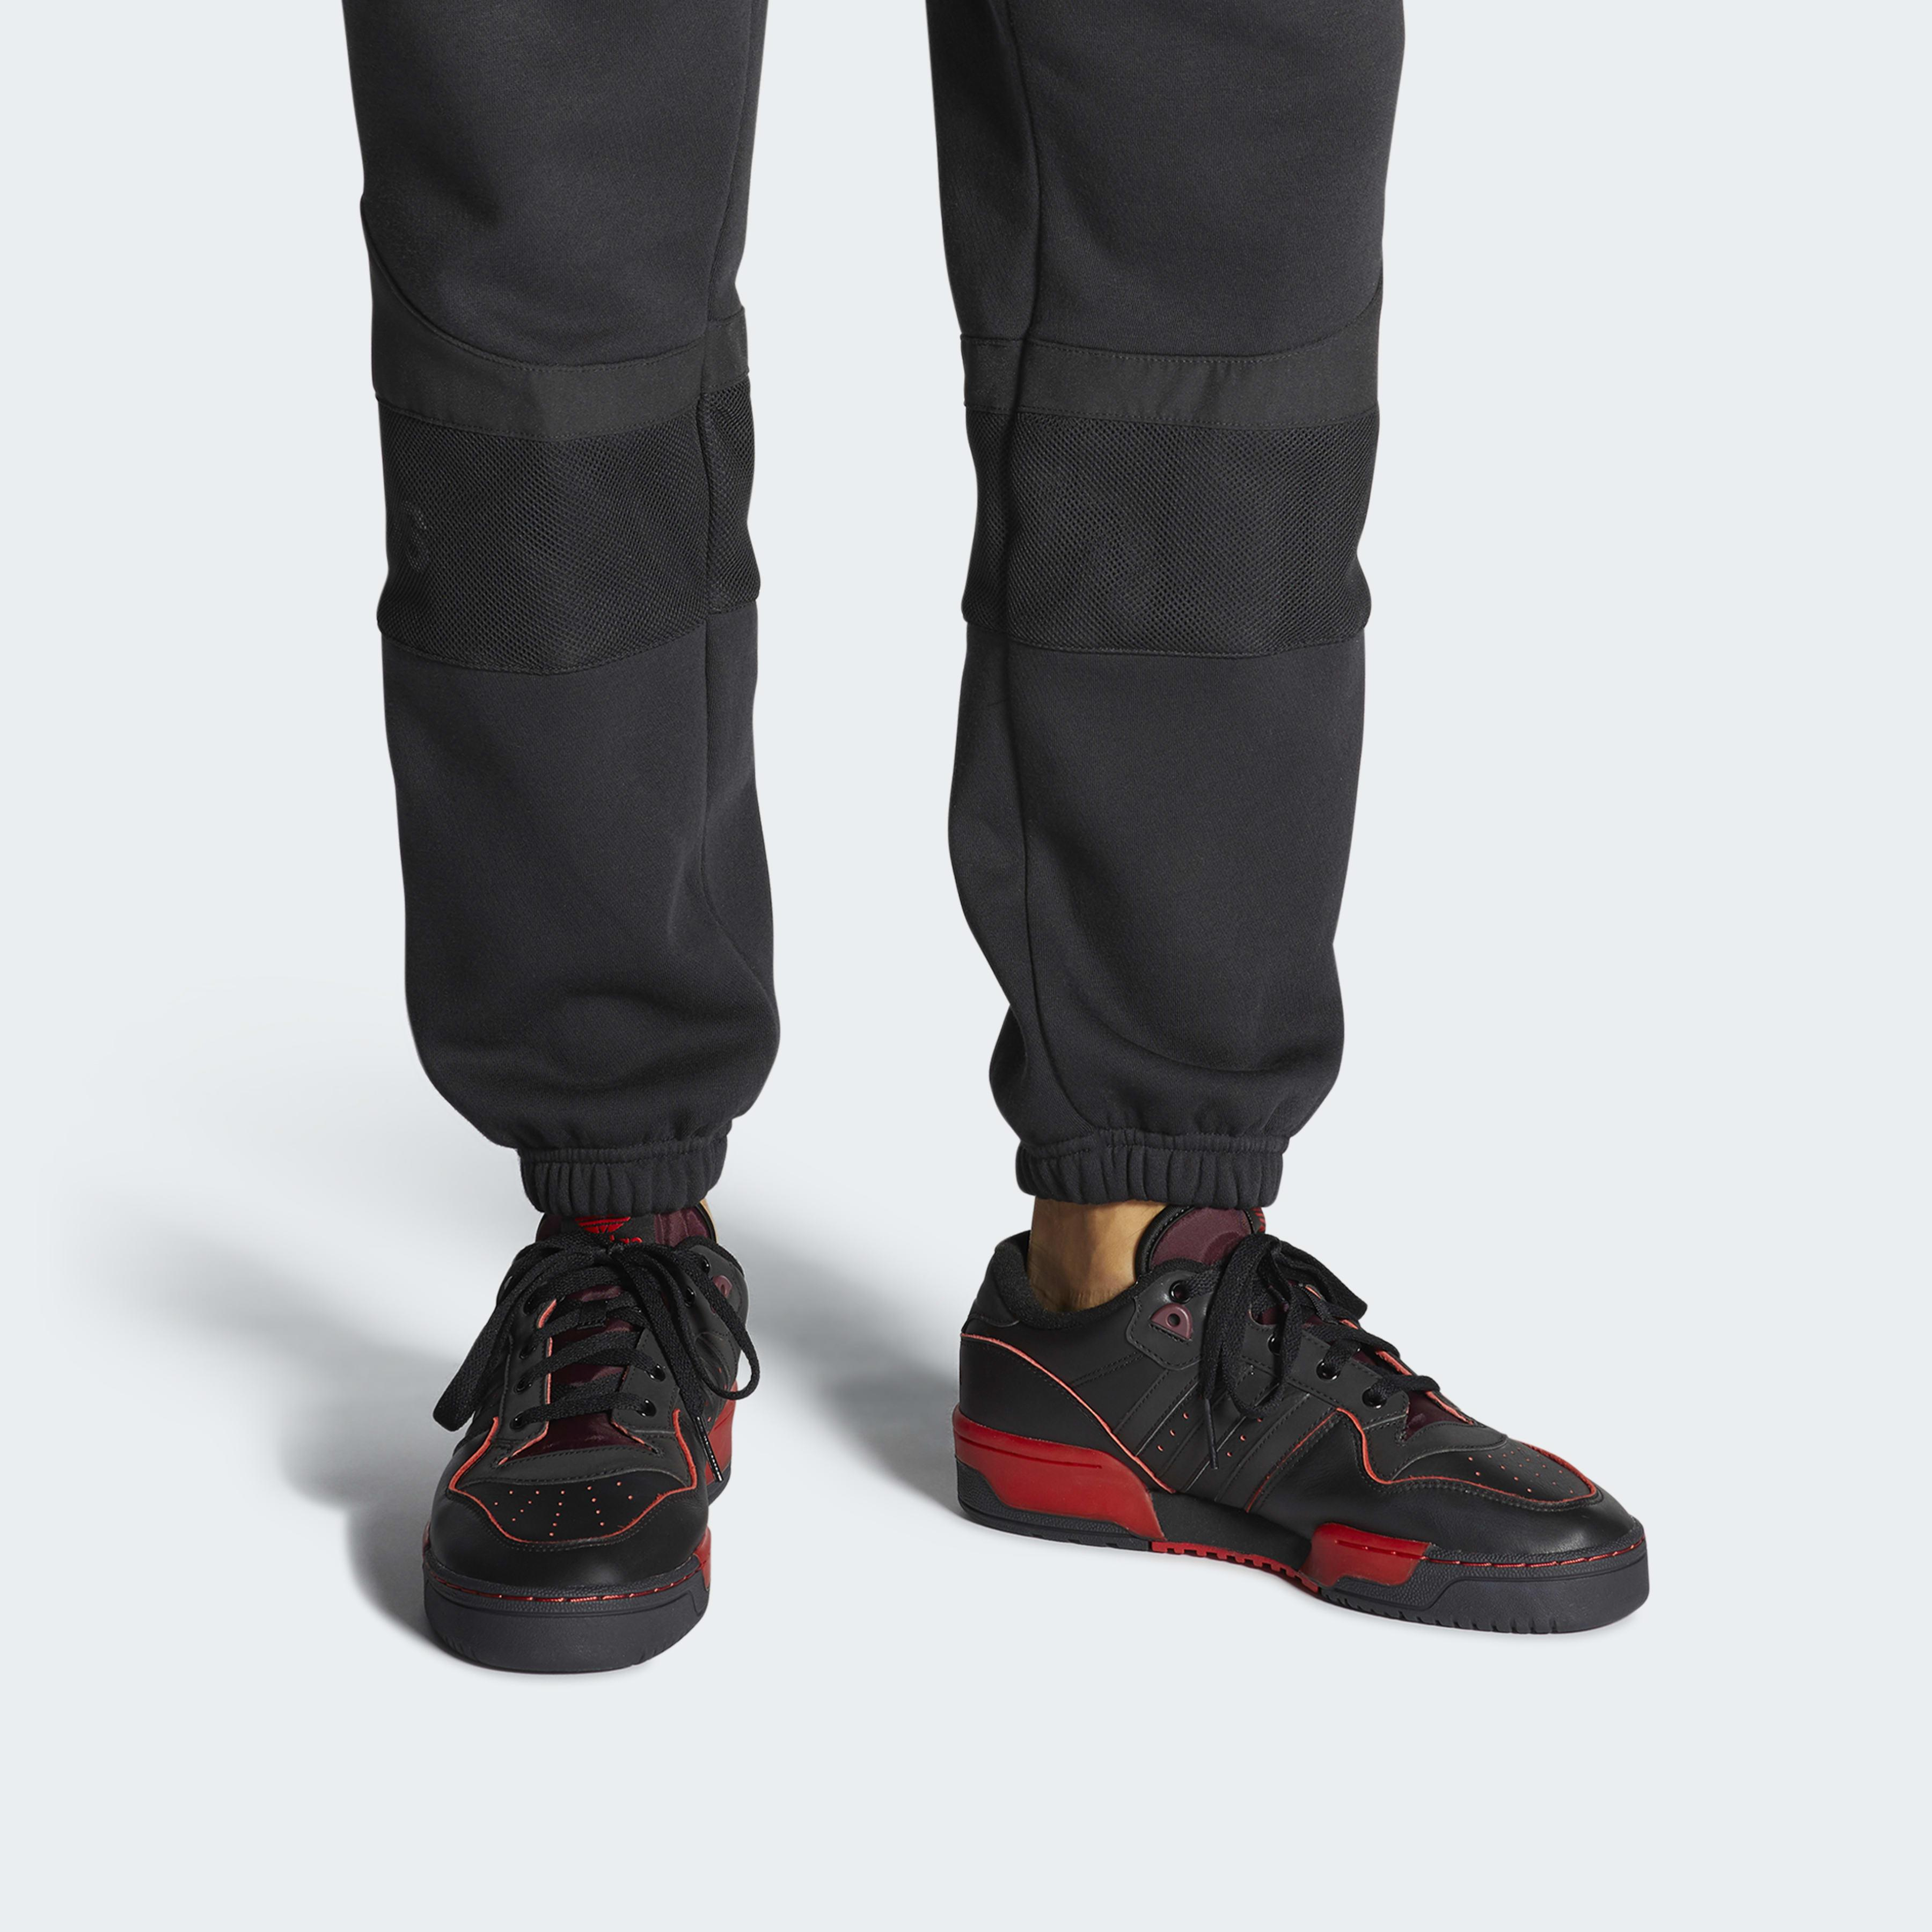 Chaussure Rivalry Low Star Wars adidas en coloris Noir